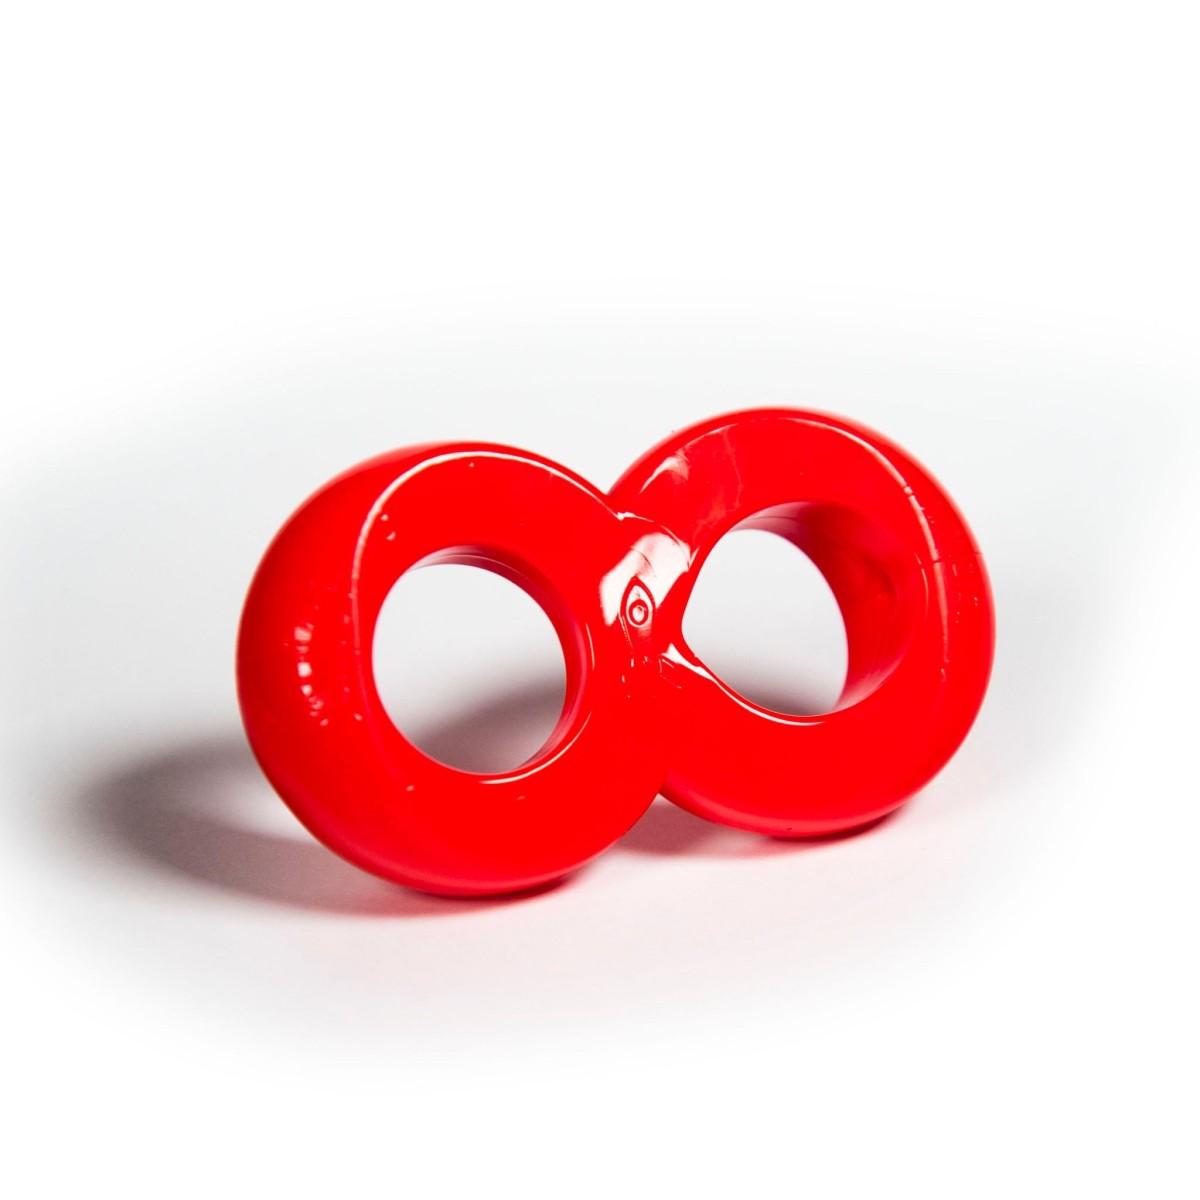 Zizi Cosmic Ring Cock Ring Red